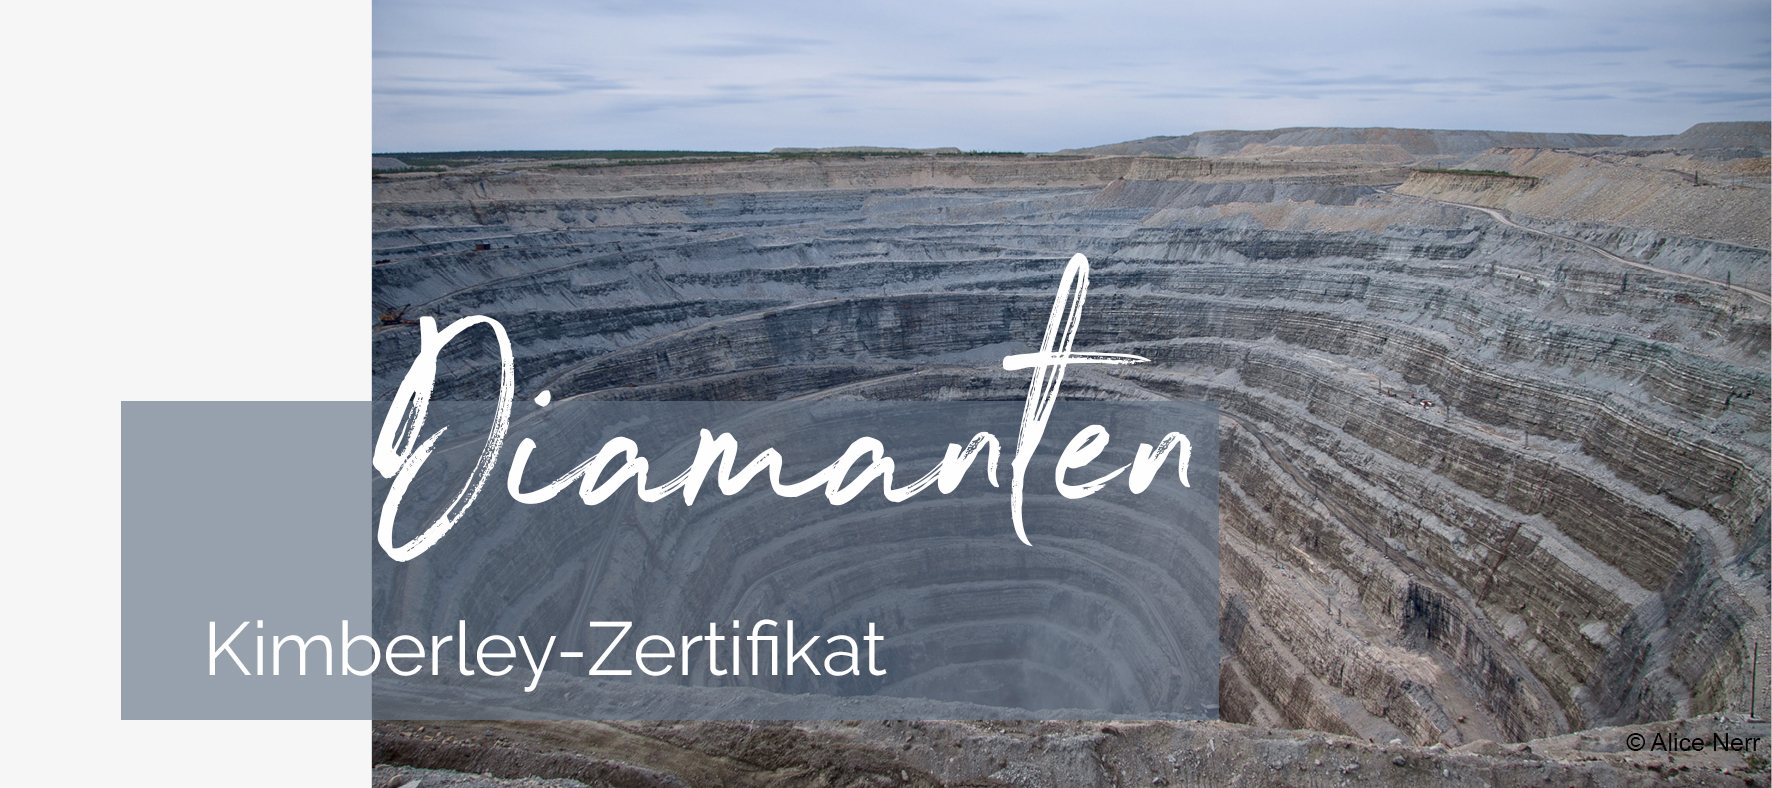 Diamanten / Kimberley-Zertifikat | SYNO Schmuck-Design